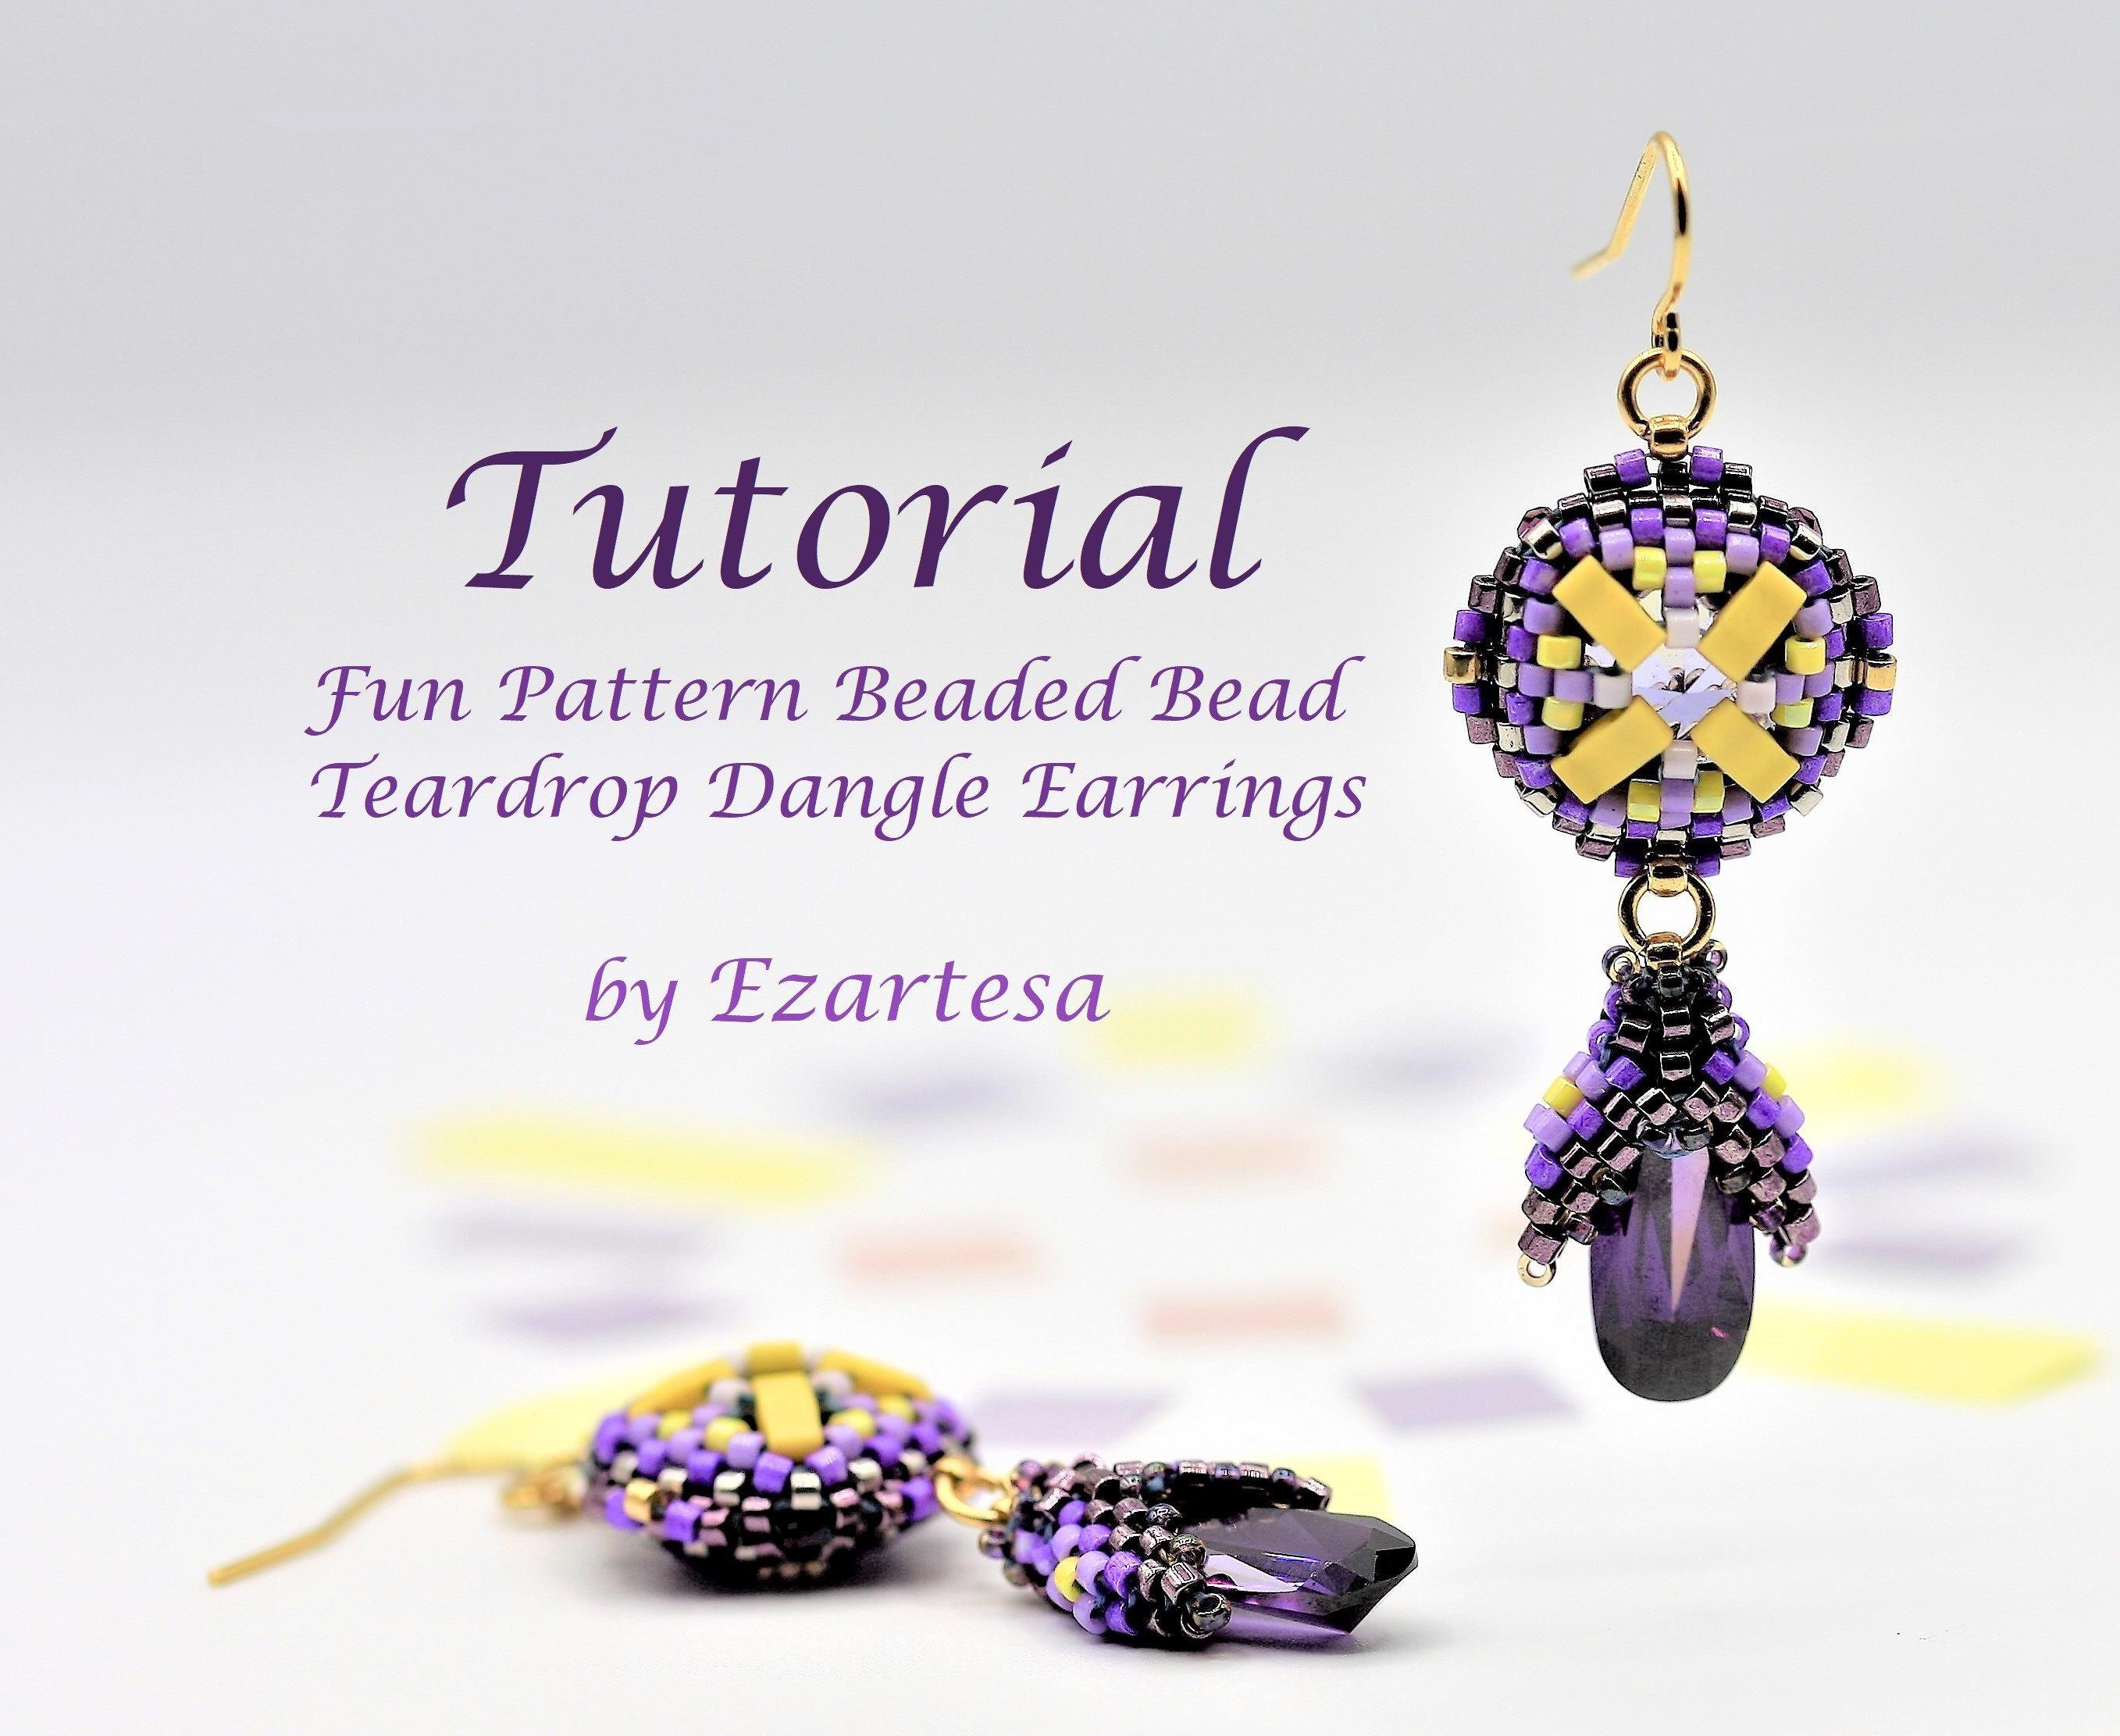 Fun Pattern Beaded Bead and Teardrop Dangle Earrings Tutorial Inspired by Aquarius Sign Birthstones and Colors, Beading Pattern by Ezartesa